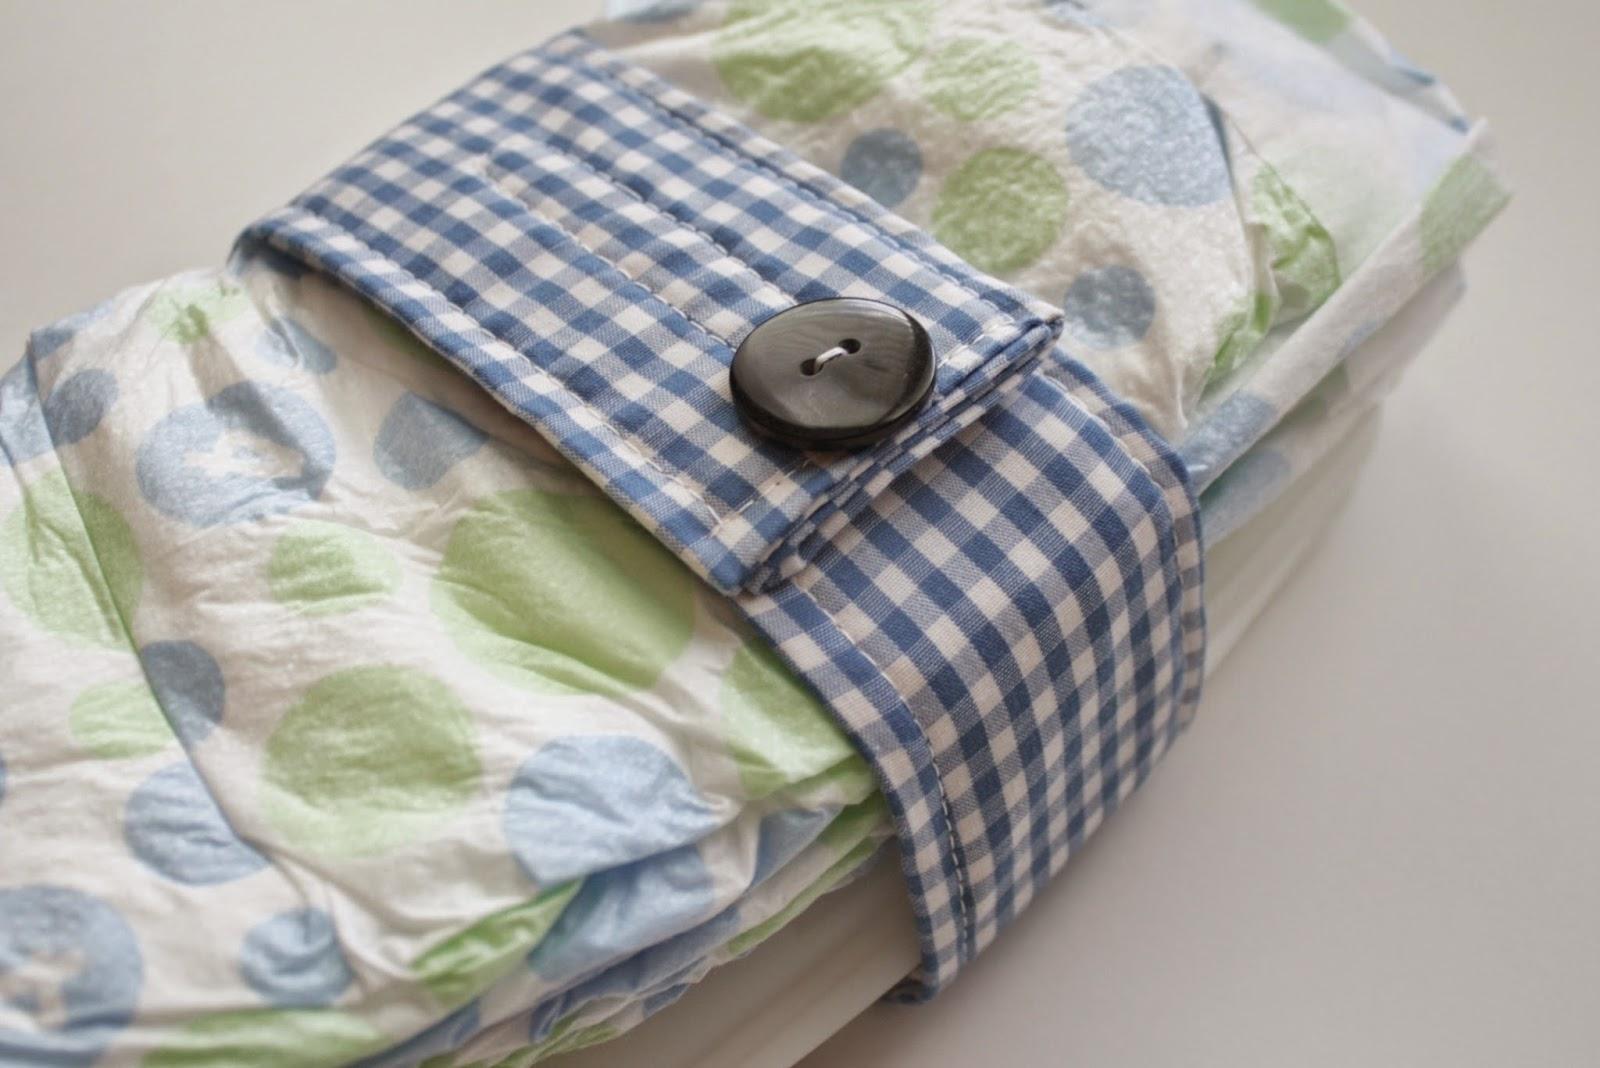 http://www.livealittlewilderblog.com/2014/07/the-diaper-strap-tutorial.html